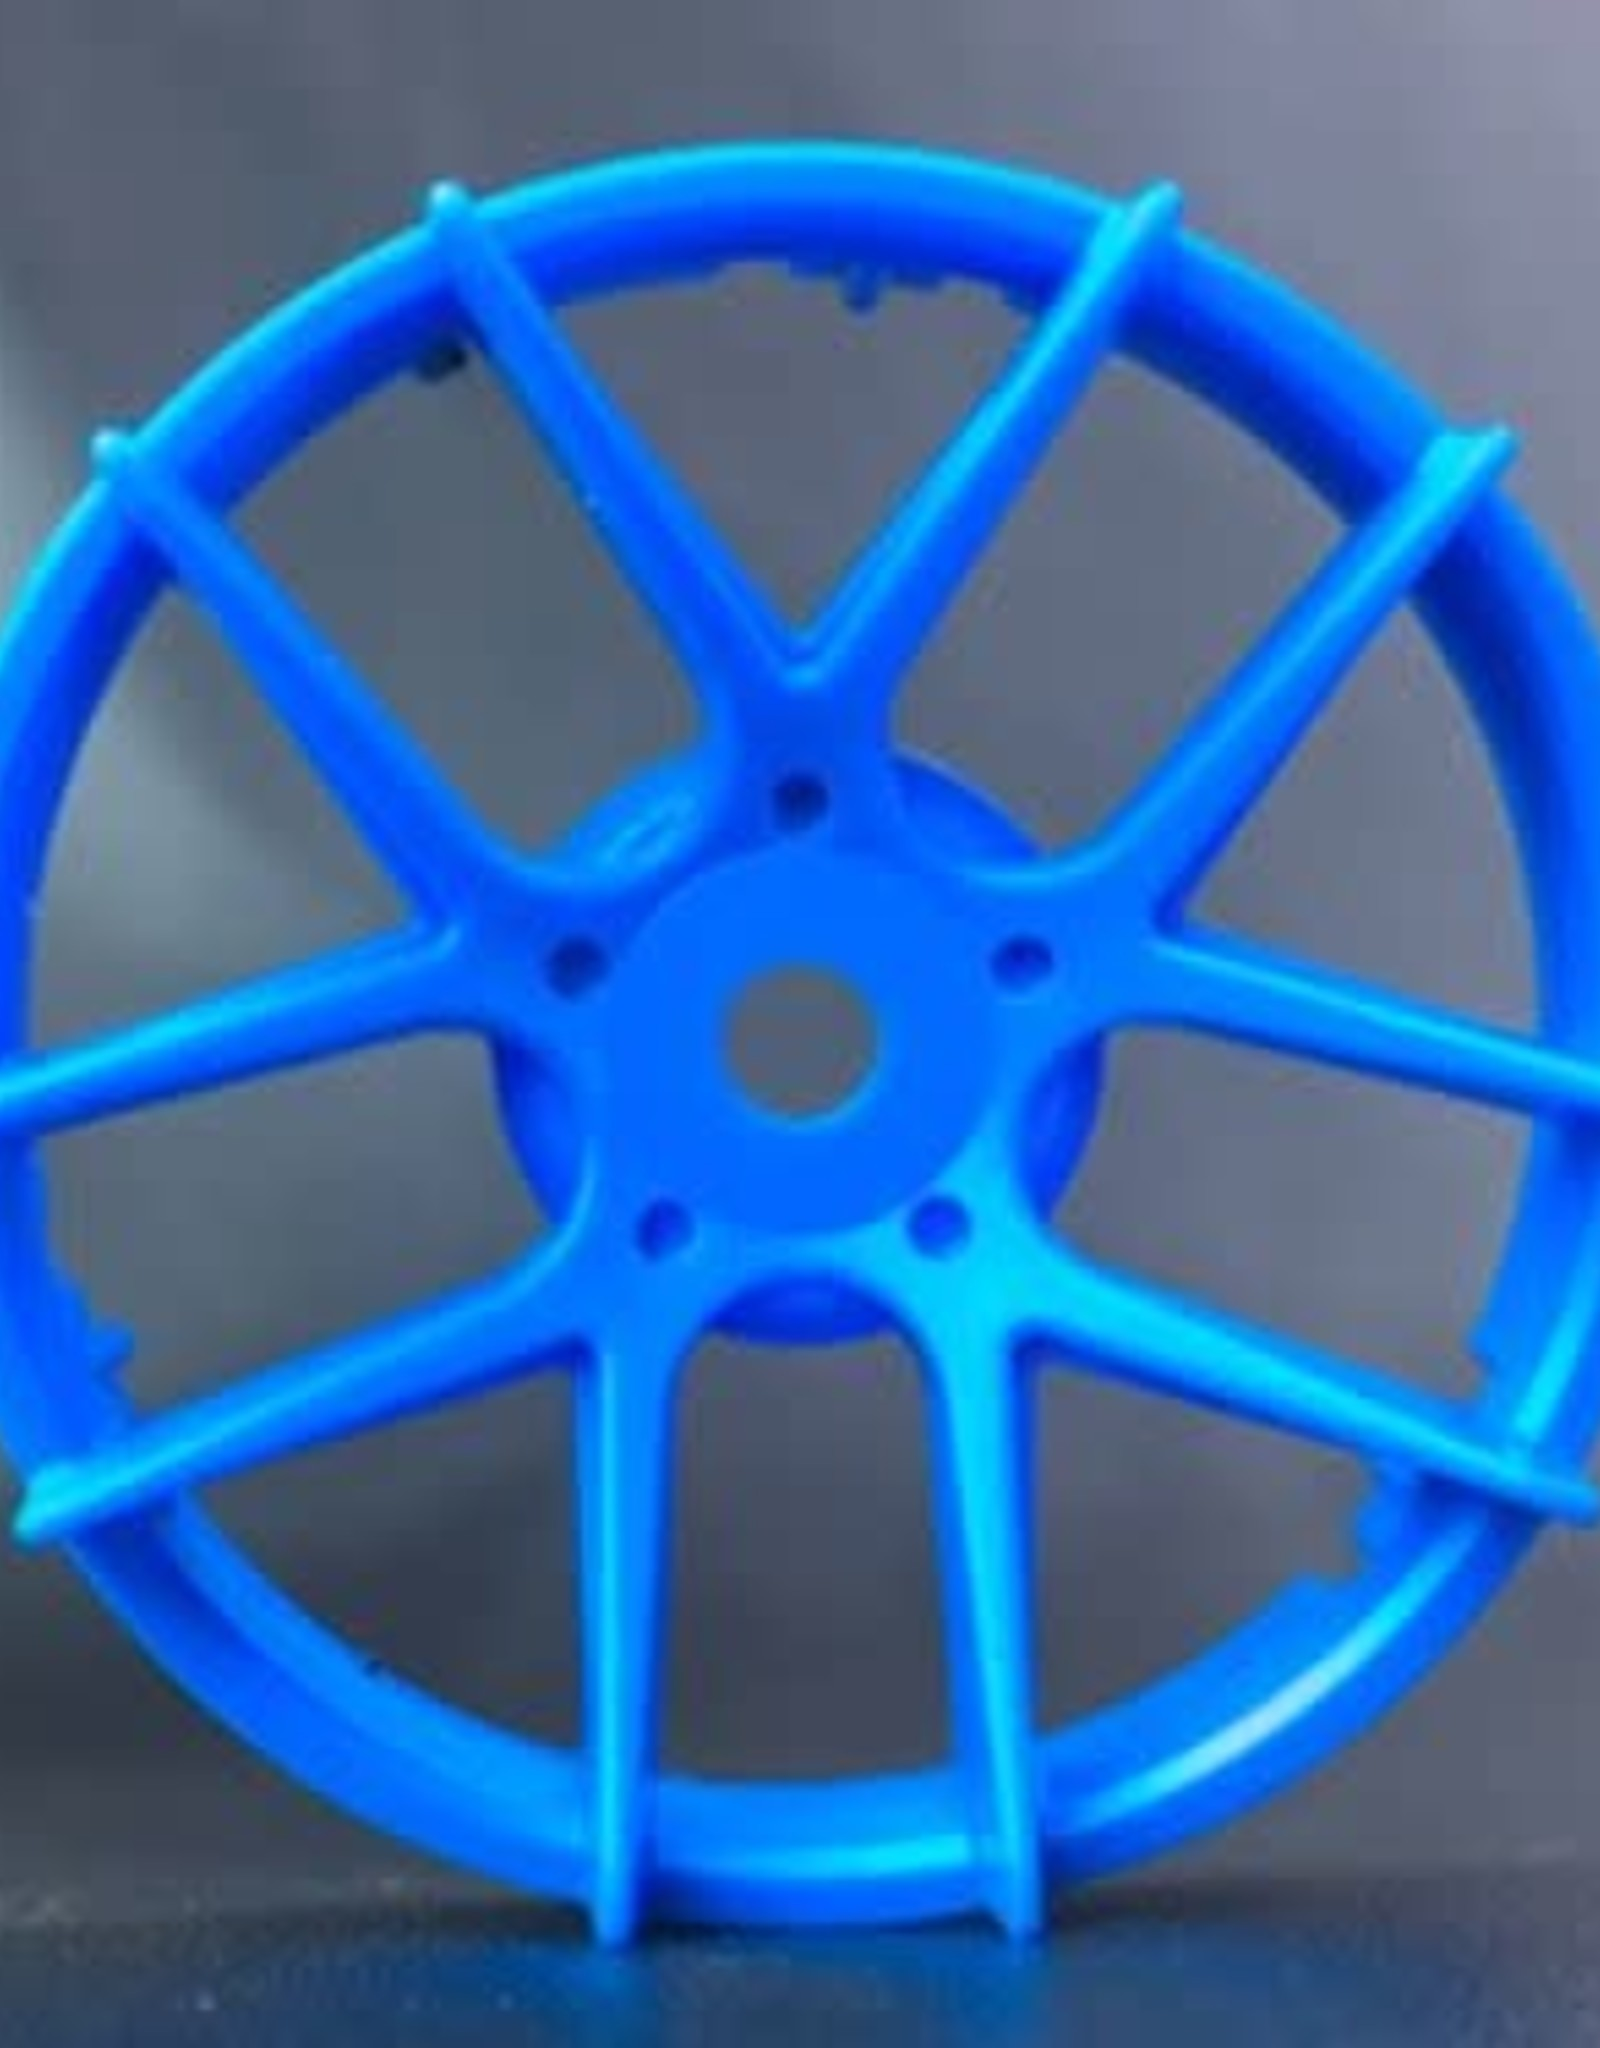 Tetsujin TT-7544 Super Rim Jasmine Blue Disks 2pcs. by Tetsujin